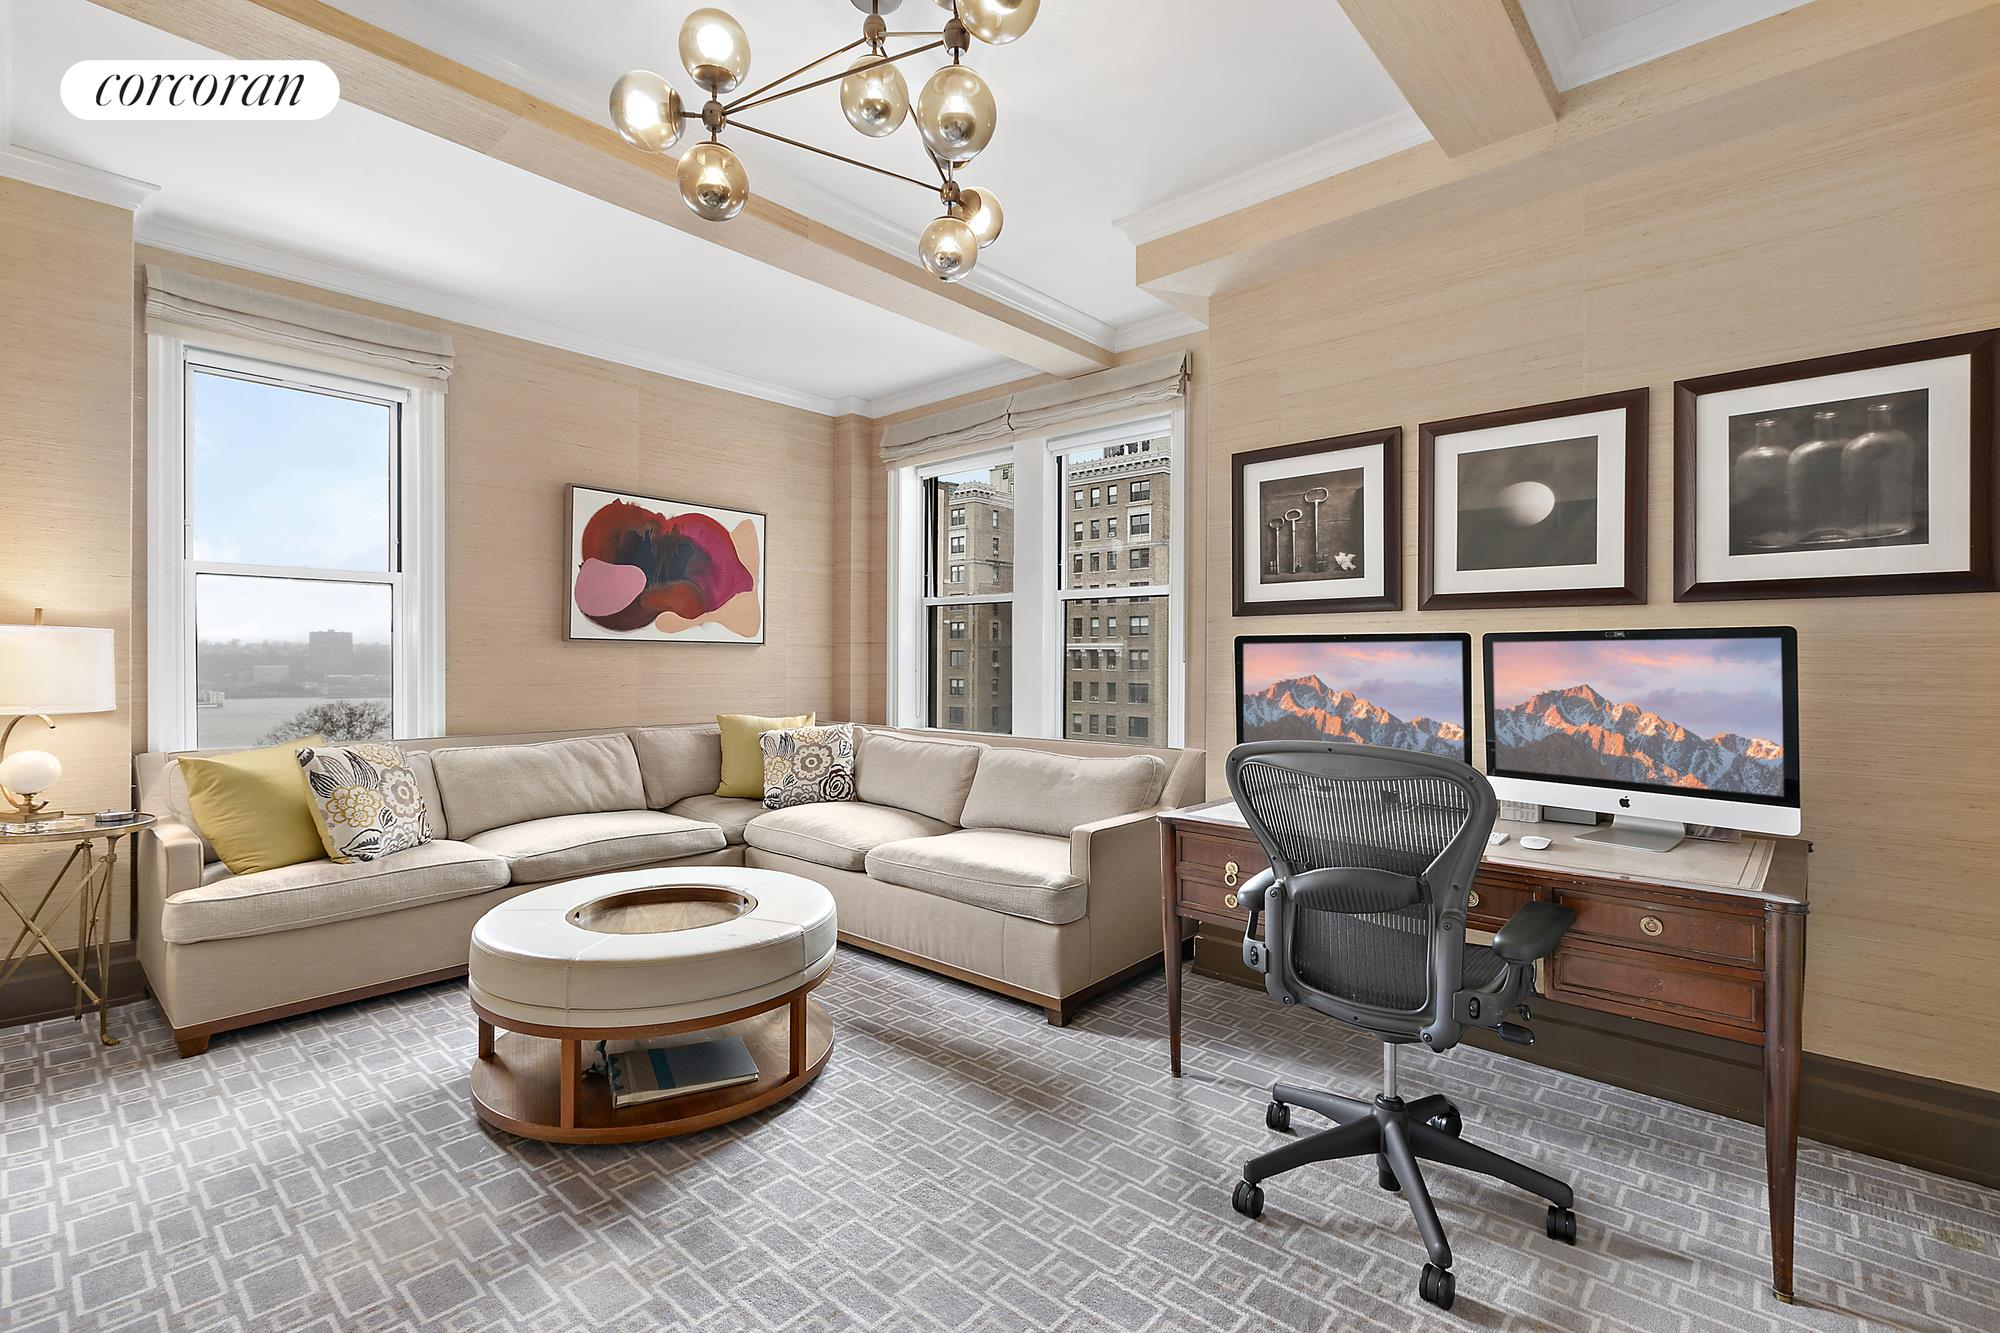 845 West End Avenue Interior Photo